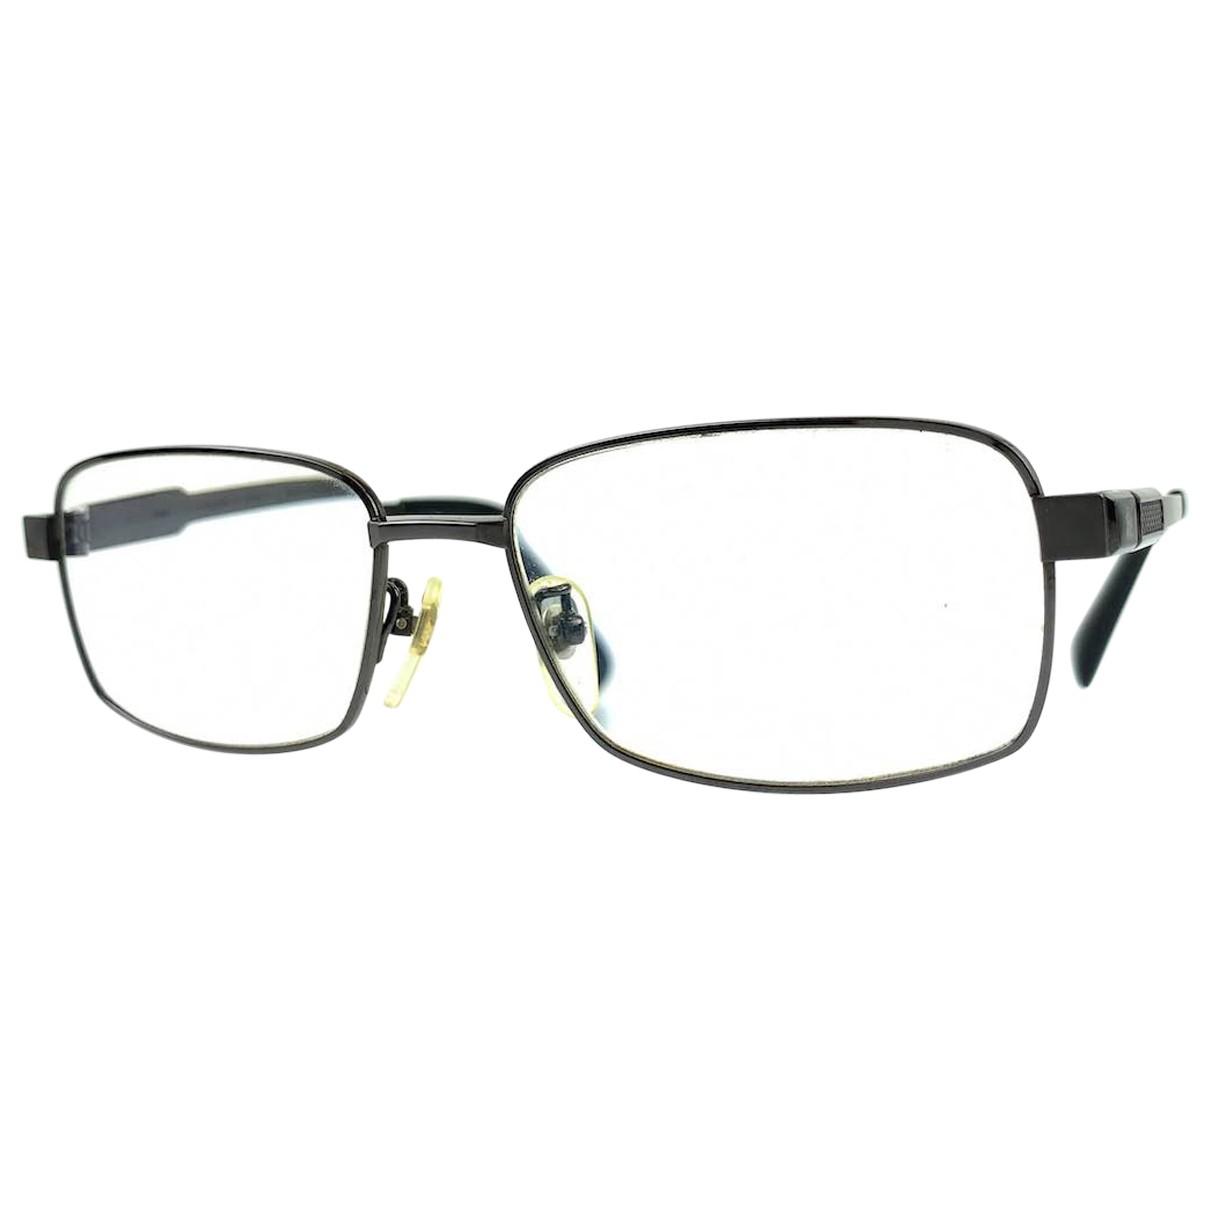 Gafas Alfred Dunhill